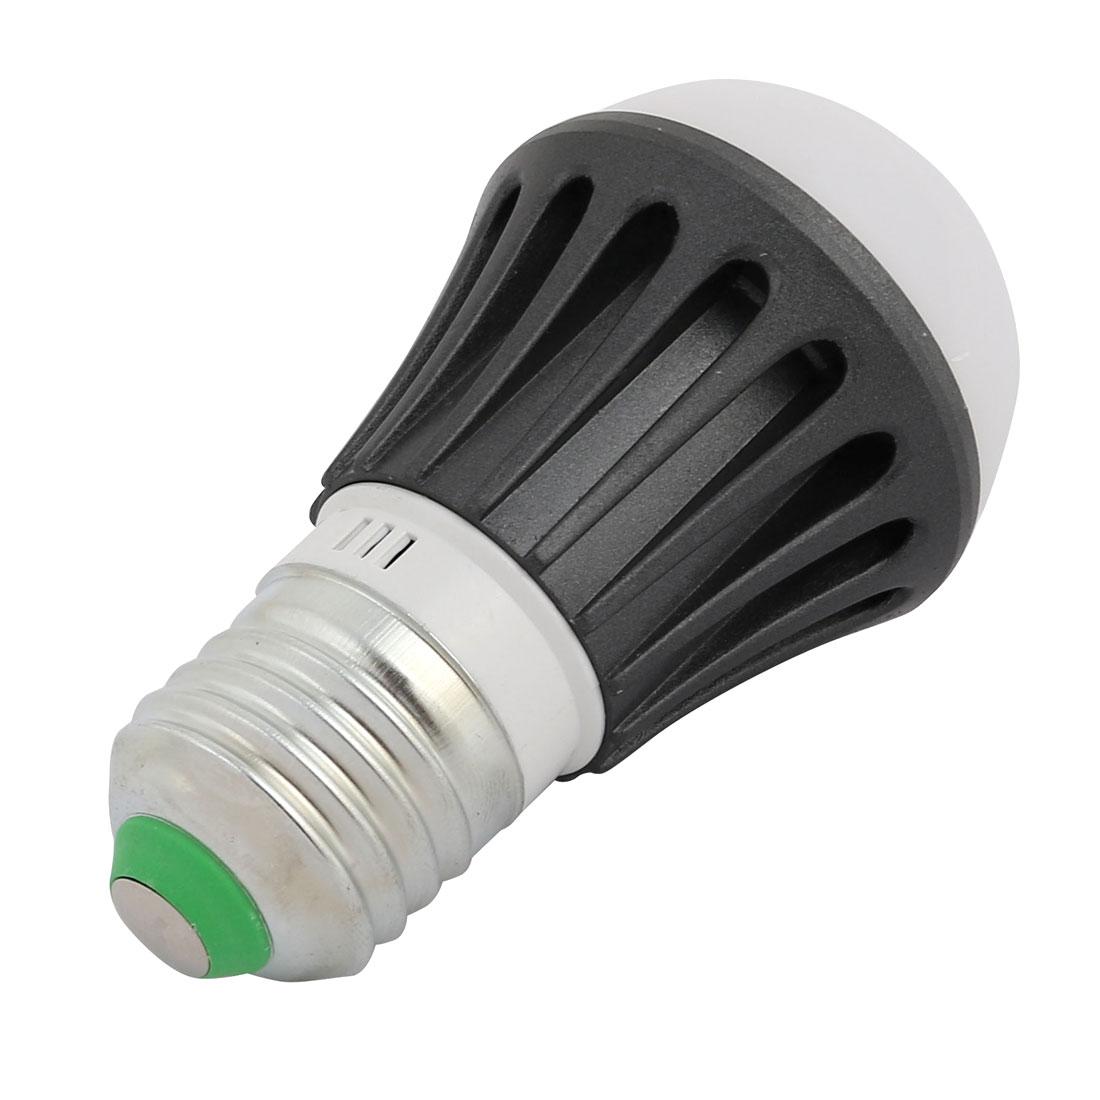 4 Pcs 3W Aluminum Alloy Black Ball - Bulb Lamp Housing E27 Base w White Cover - image 2 of 4